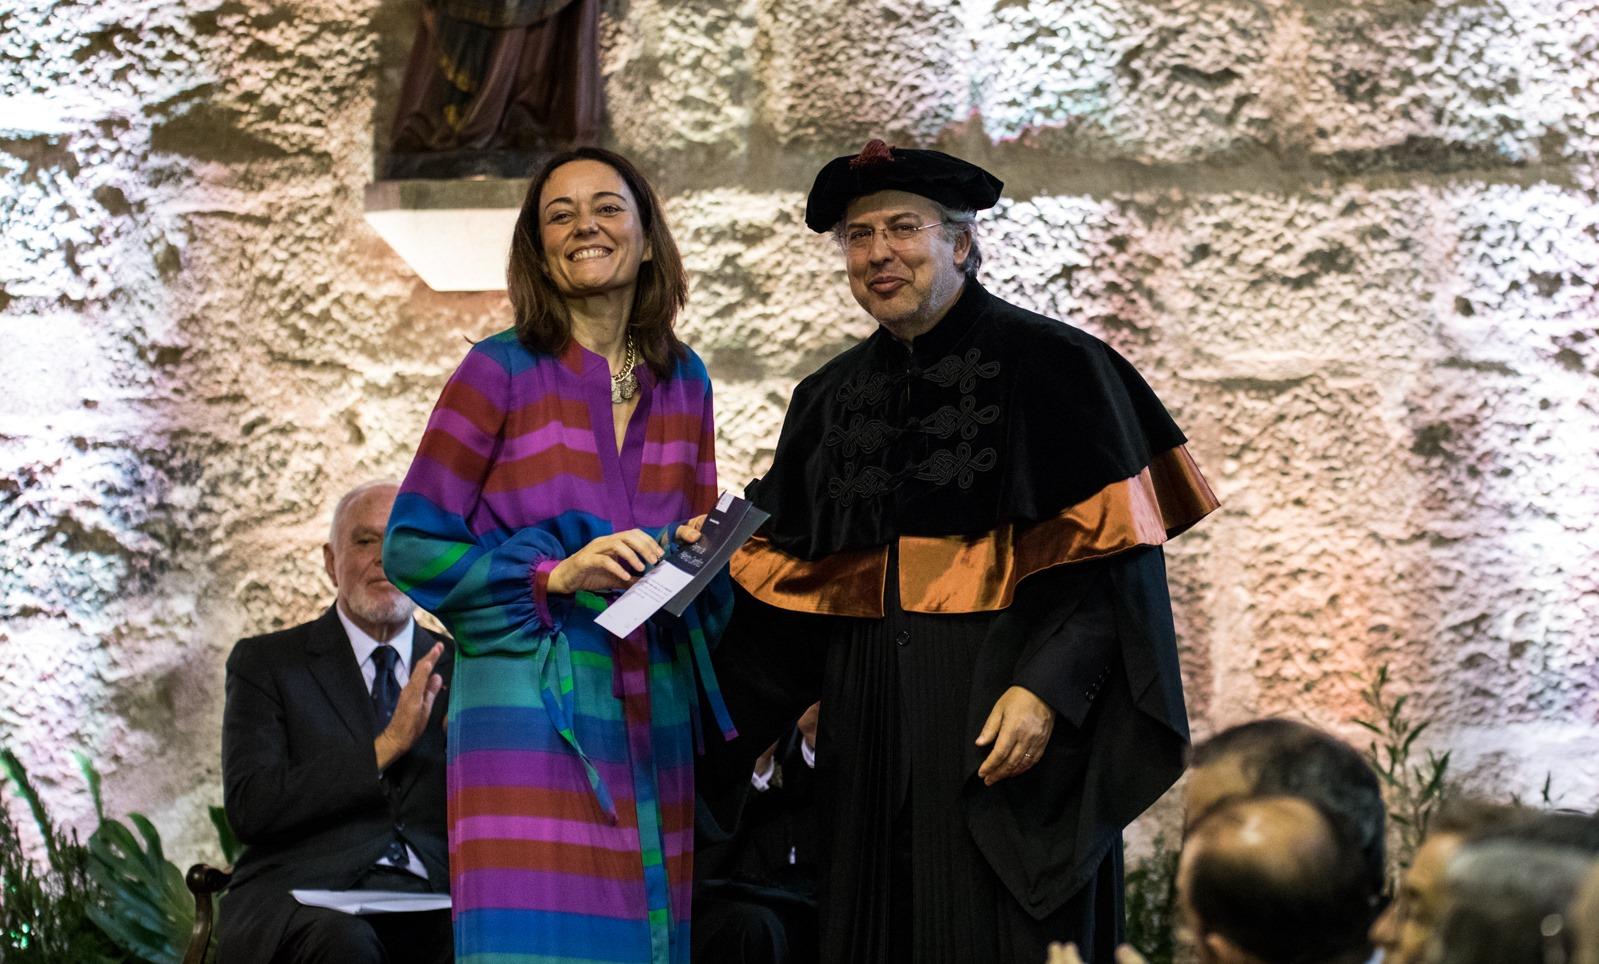 Prémio de Mérito Científico para Patrícia Jerónimo (foto: Nuno Gonçalves)